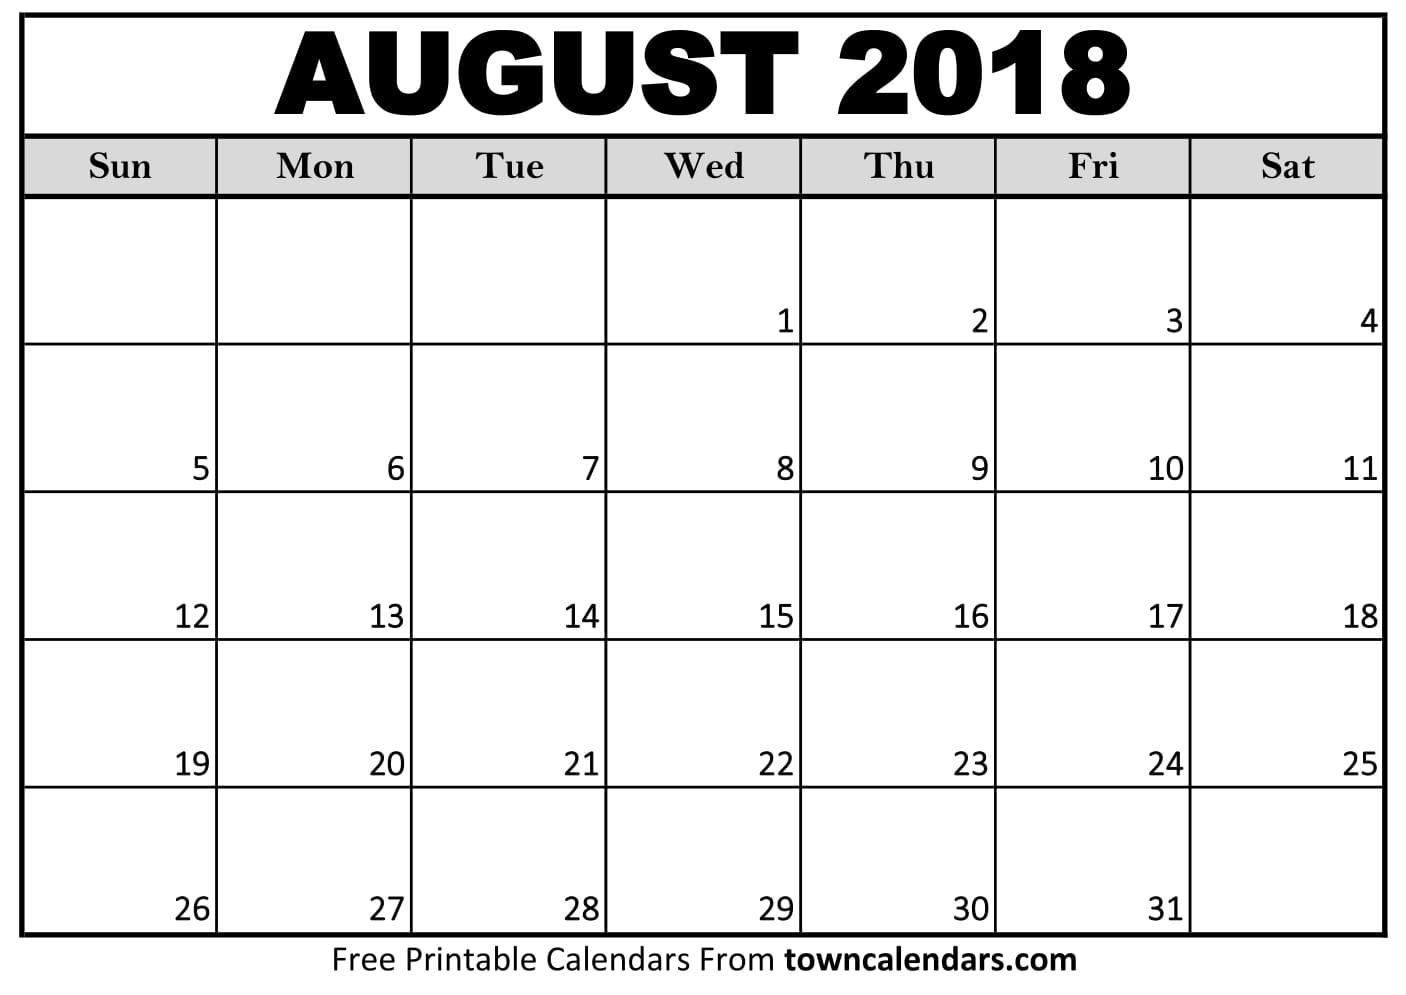 August 2018 Calendar Free Download Cheetah Template